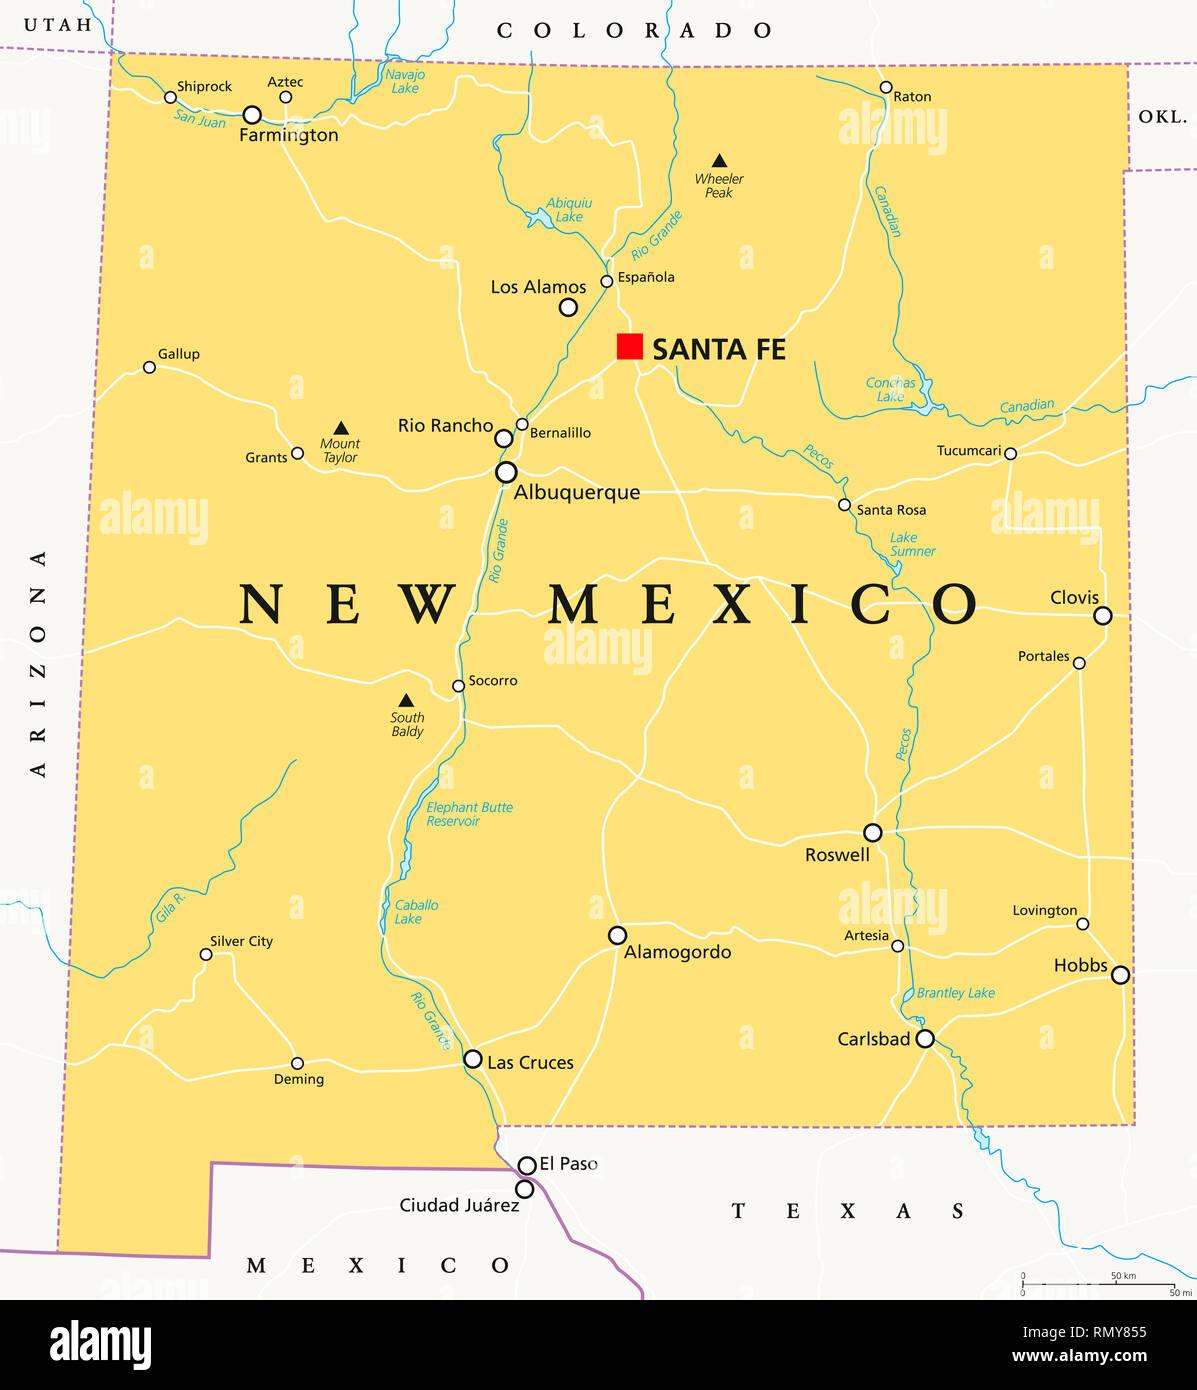 New Mexico Political Map With Capital Santa Fe Borders